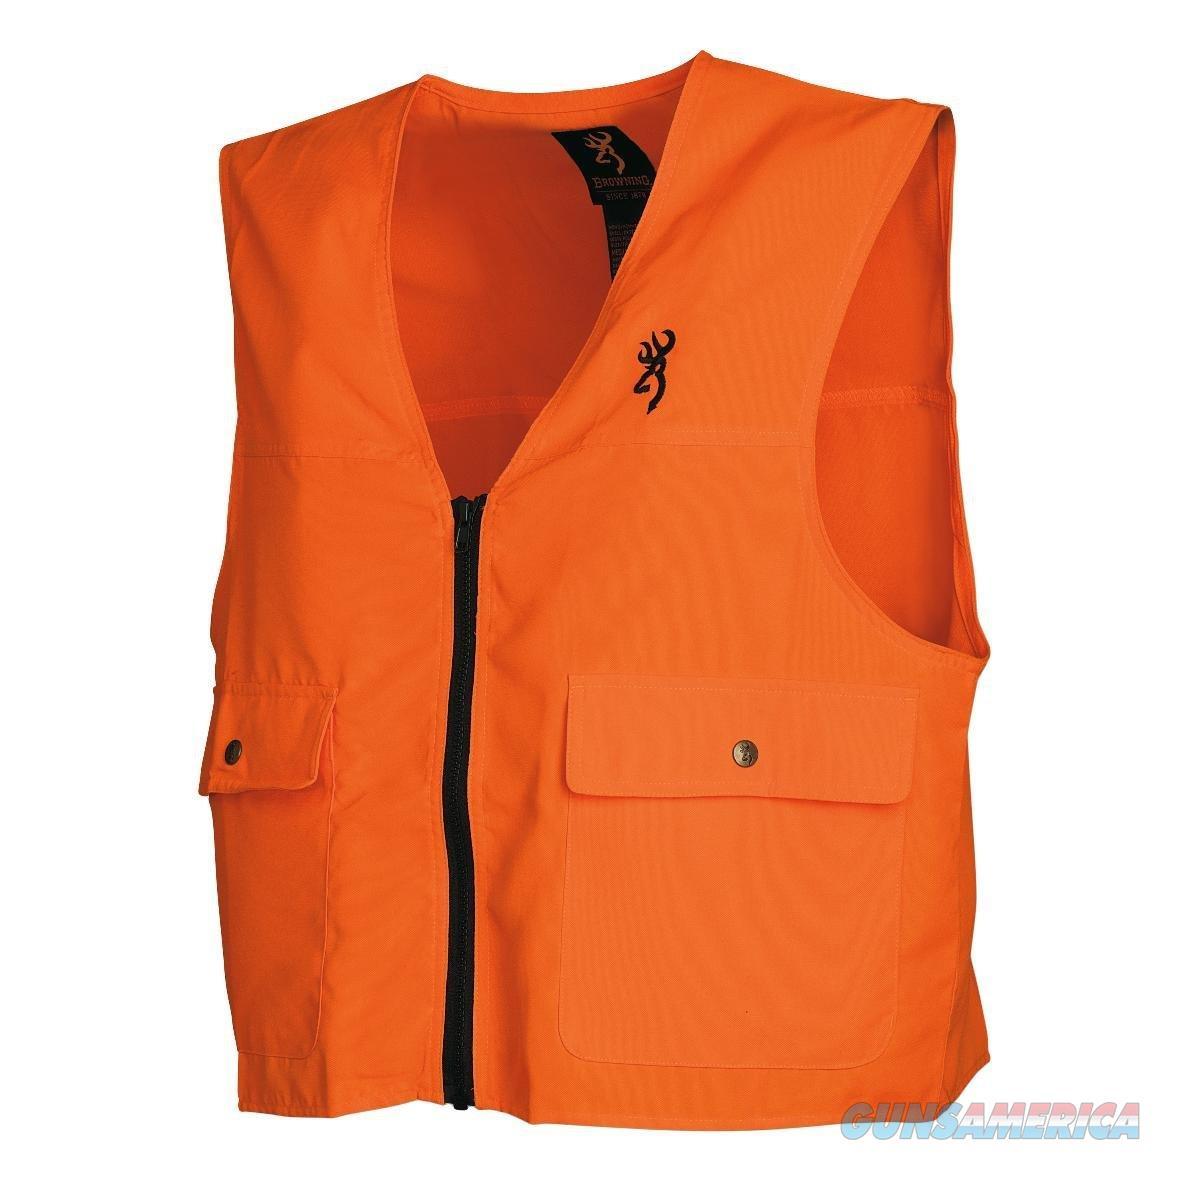 Browning Safety Vest 2XL Blaze Orange  Non-Guns > Hunting Clothing and Equipment > Clothing > Blaze Orange